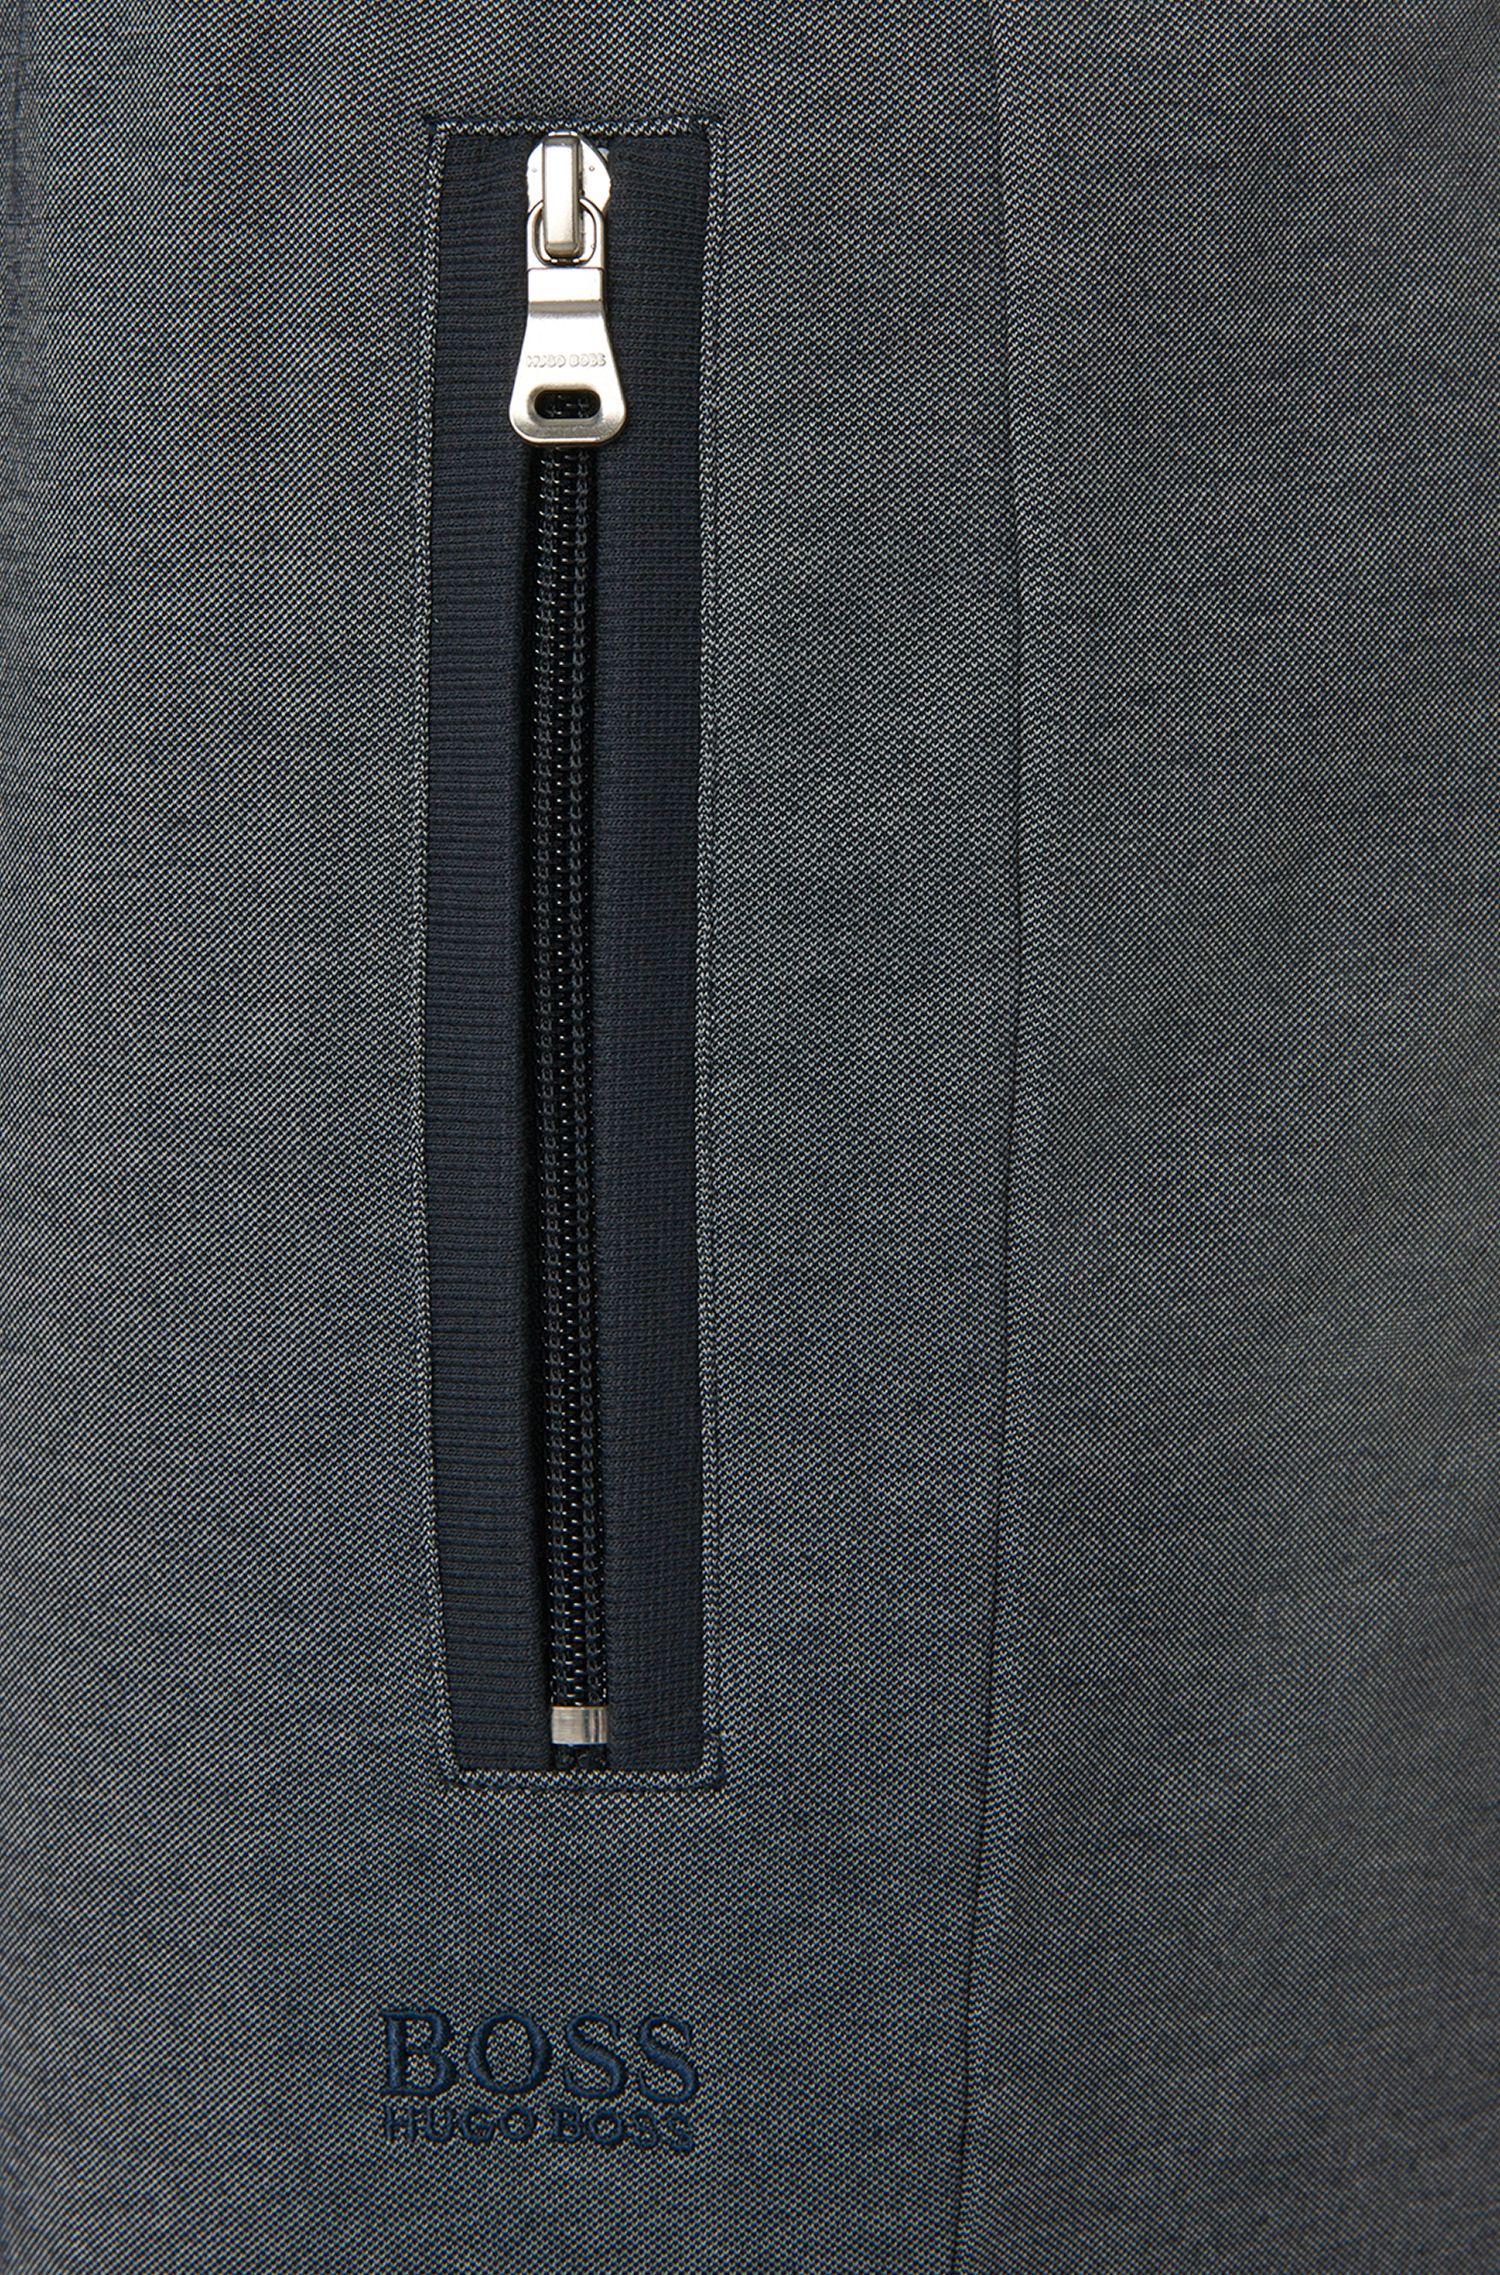 Jogginghose aus Baumwoll-Mix mit Reißverschlusstaschen: 'Long Pant'